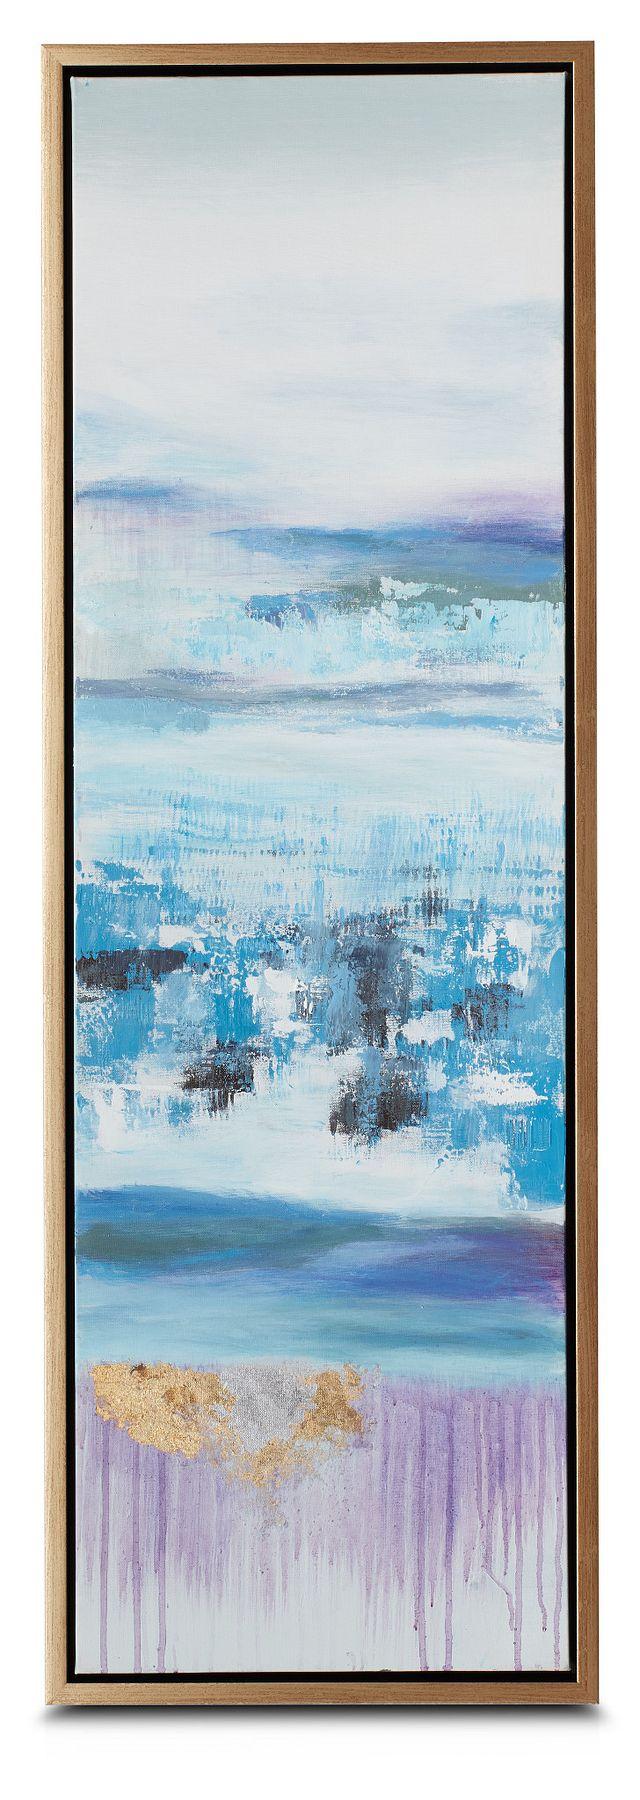 Athena Blue Set Of 3 Framed Canvas Wall Art (2)